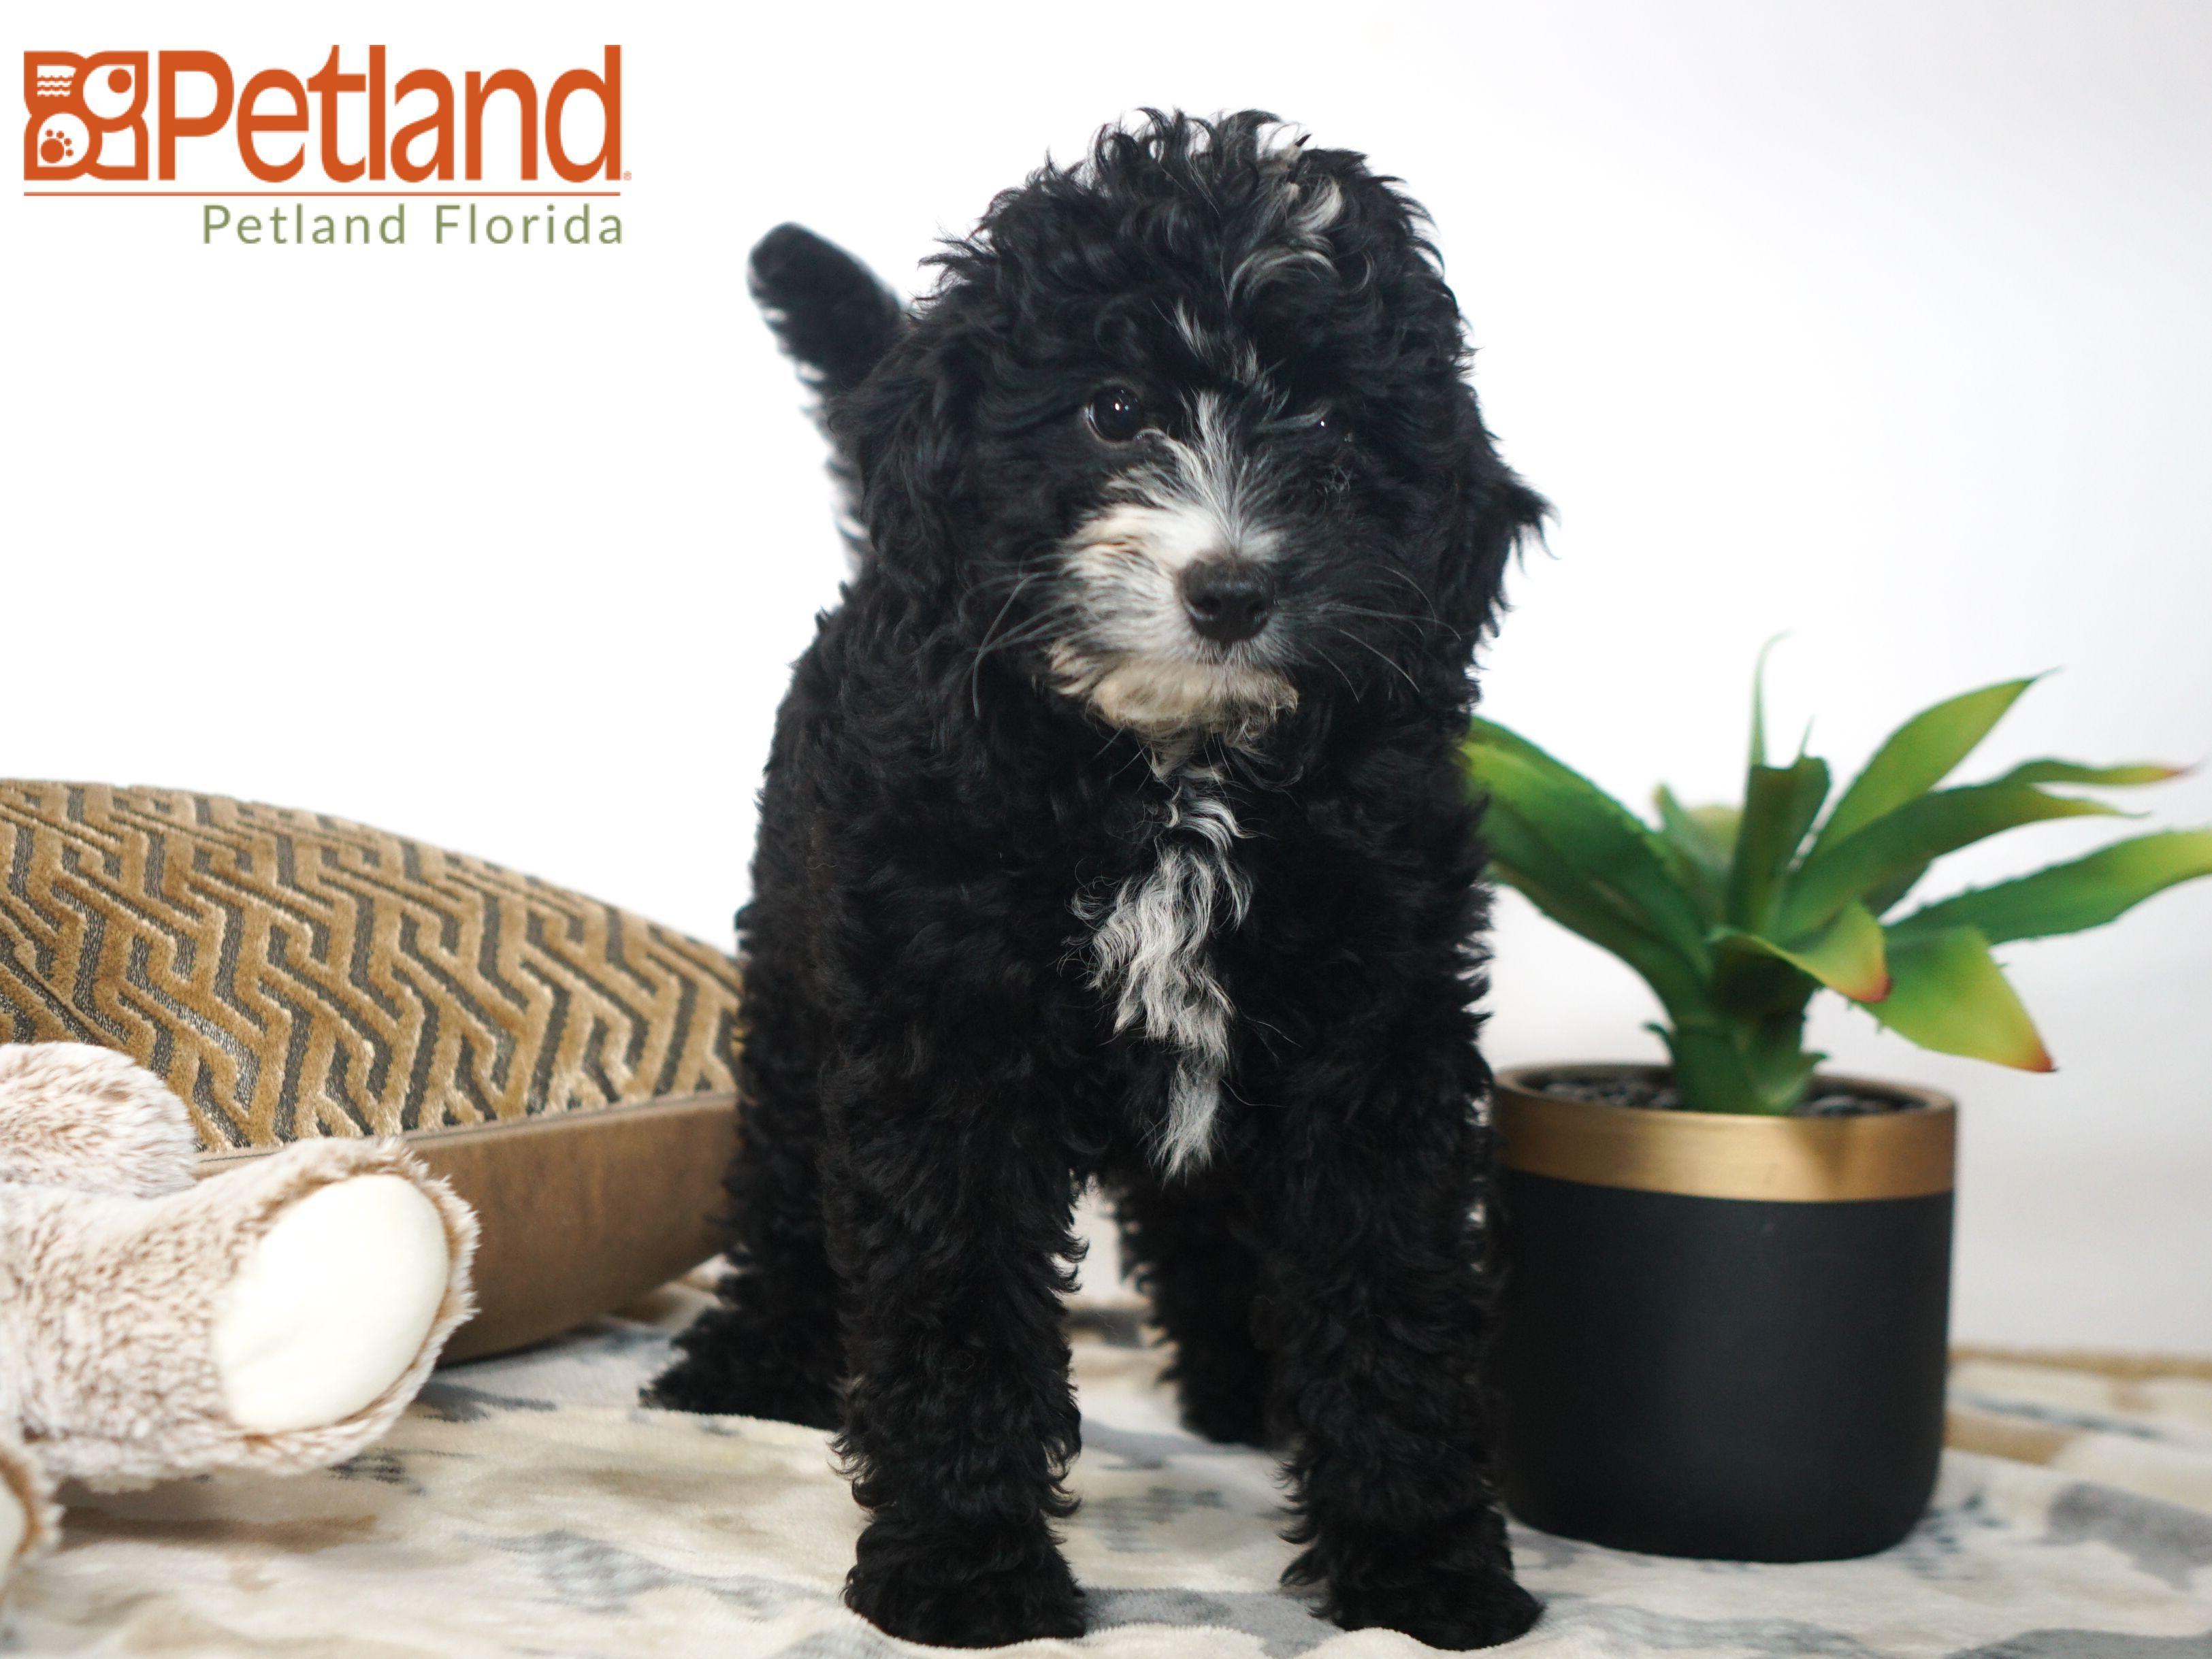 Petland Florida has Miniature Bernadoodle puppies for sale